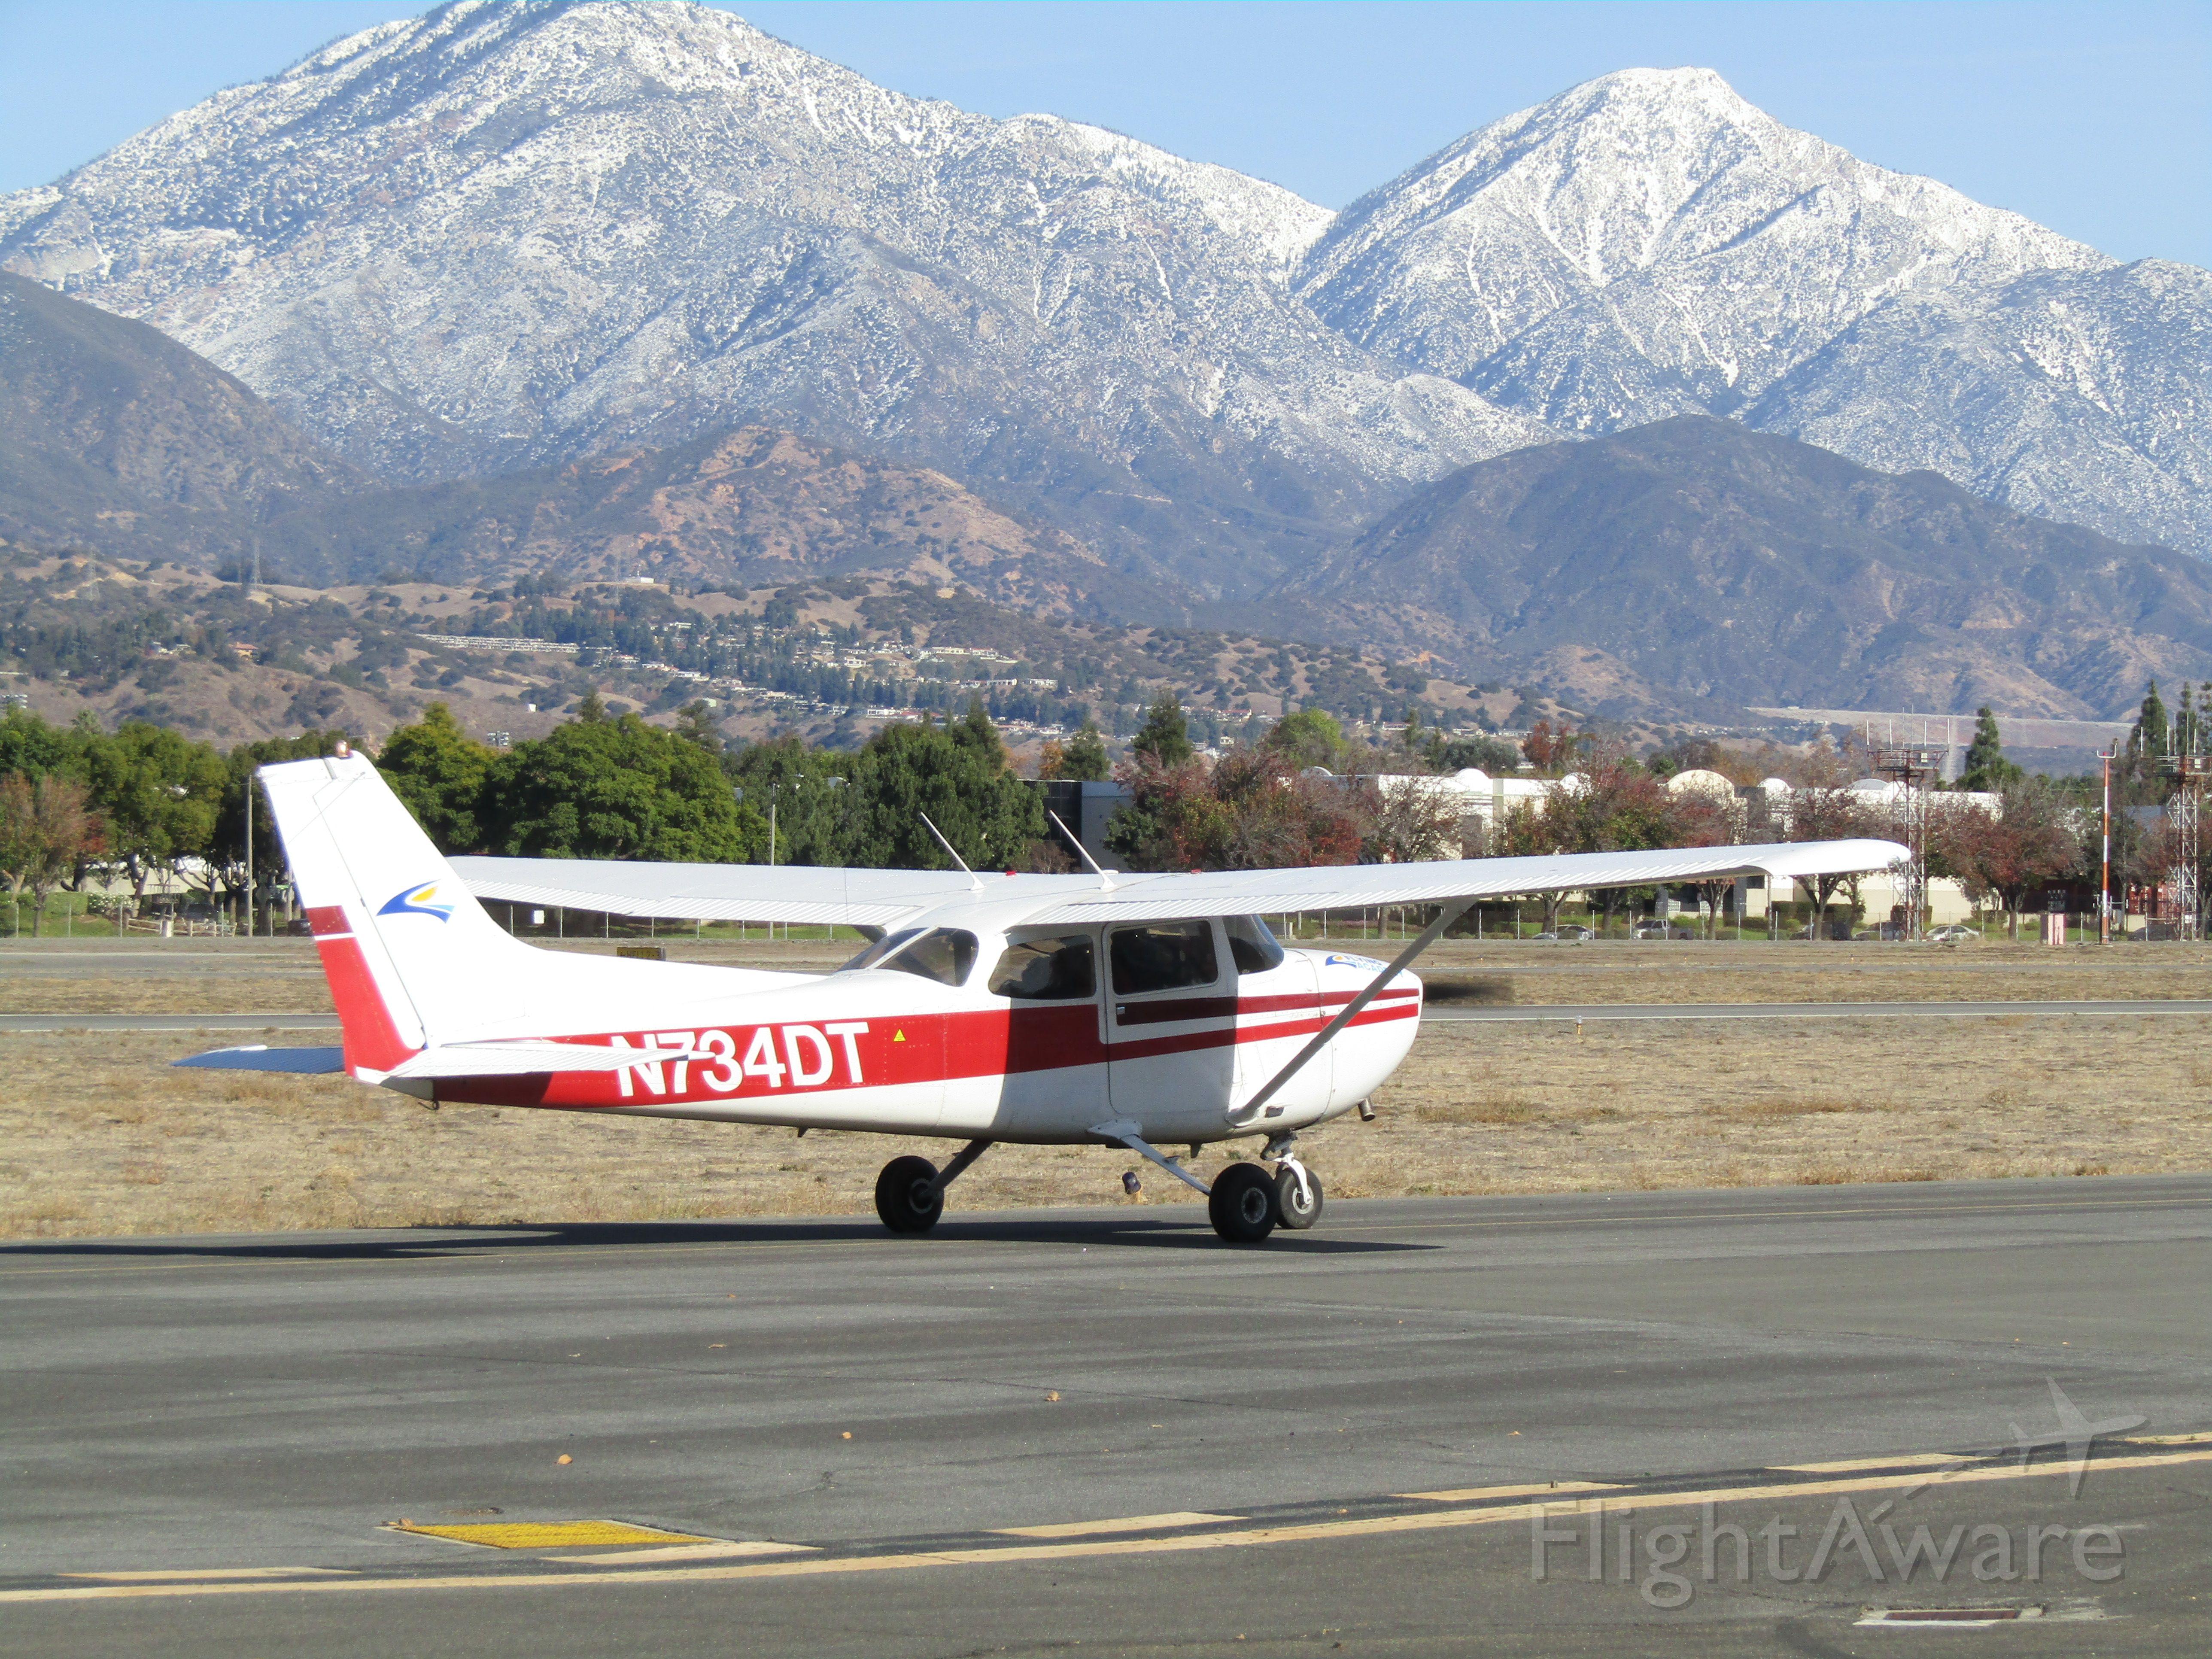 Cessna Skyhawk (N734DT) - Taxiing to RWY 26L